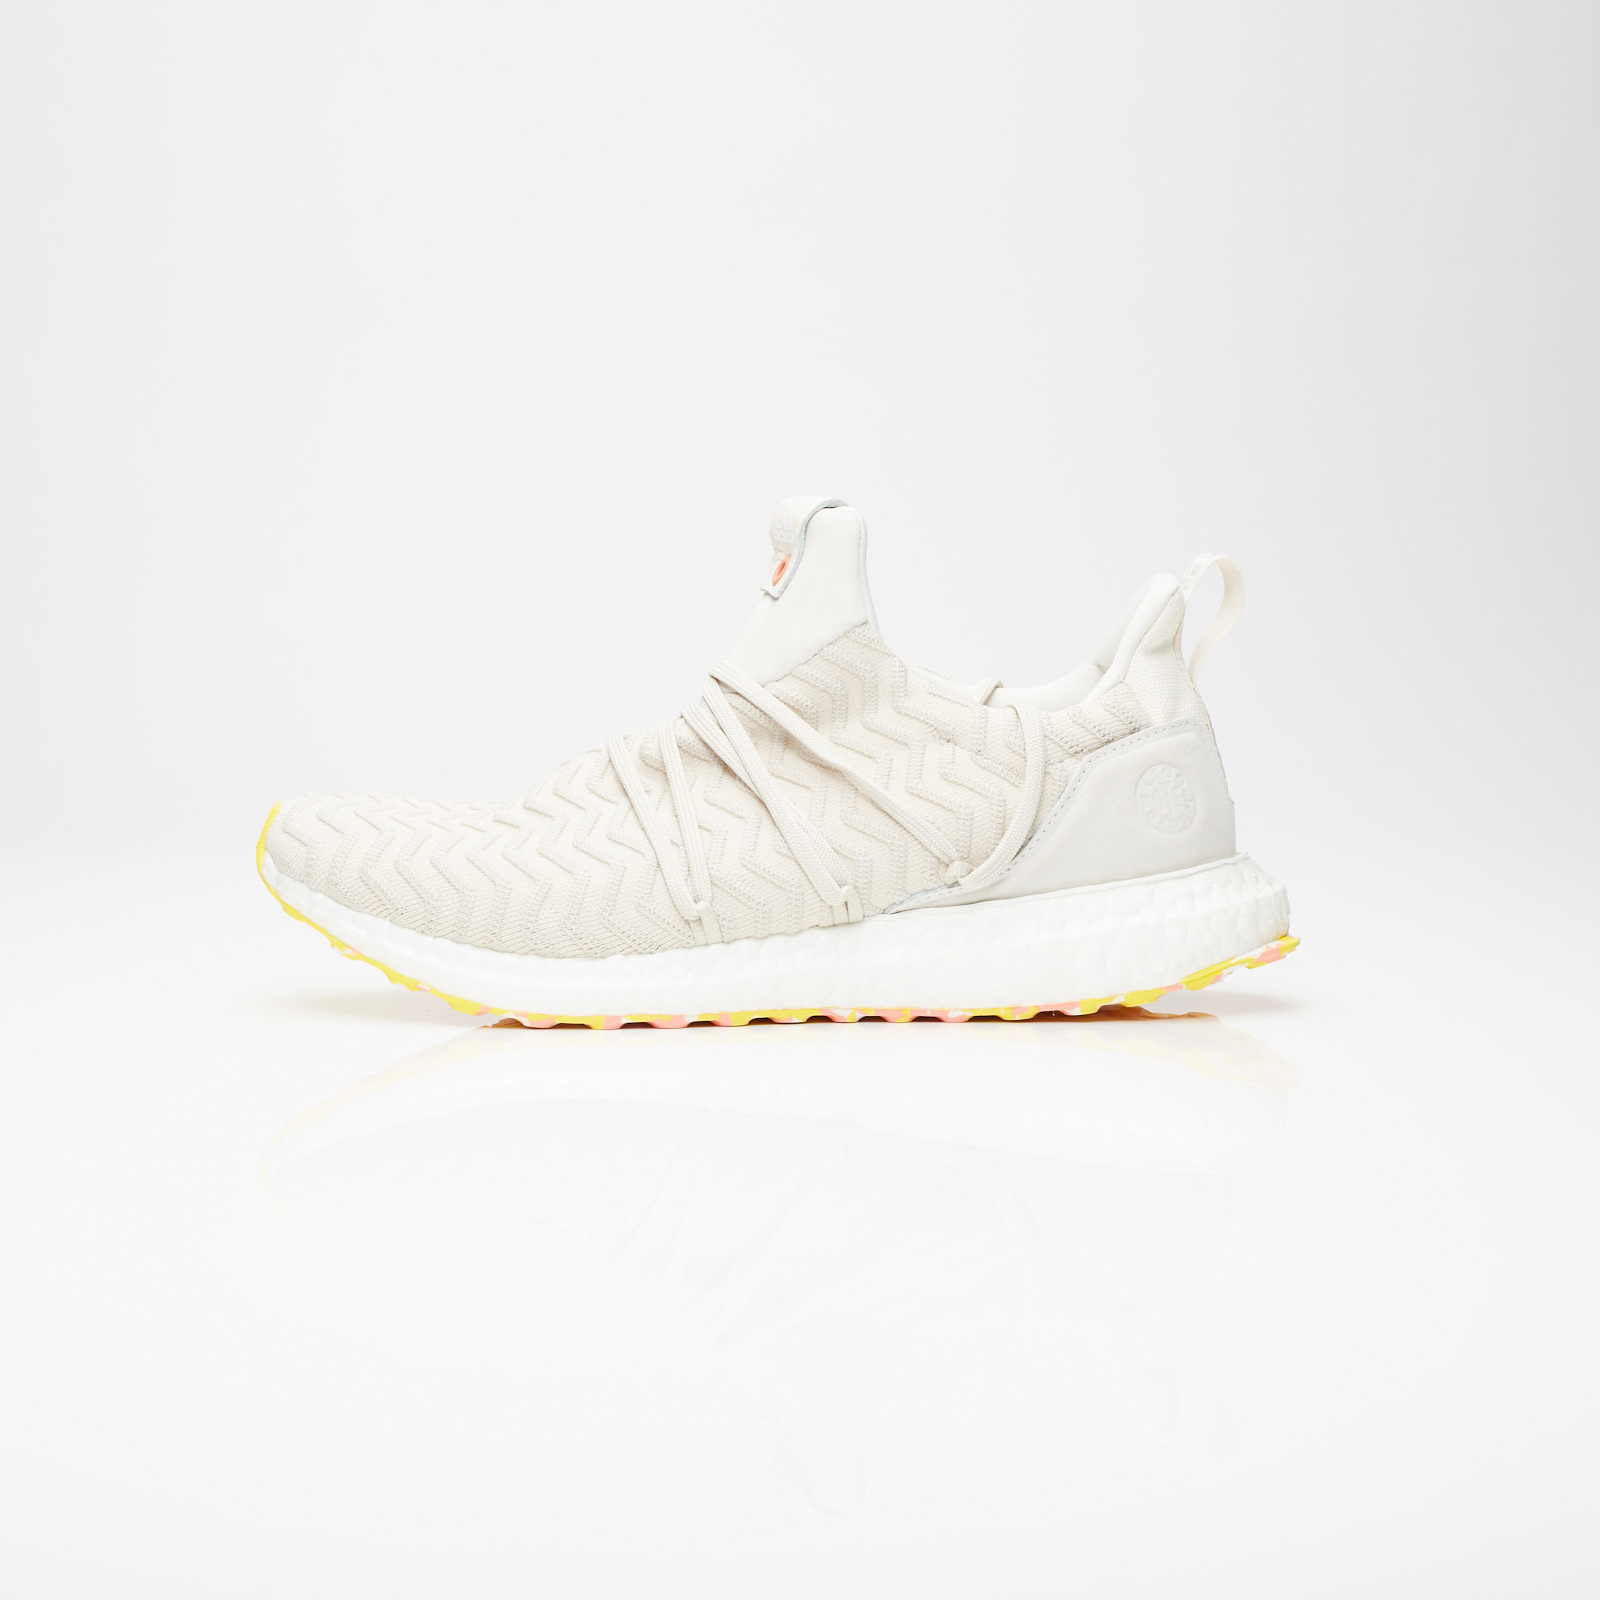 b75cac3ef105c adidas Ultraboost AKOG - Bb7370 - Sneakersnstuff